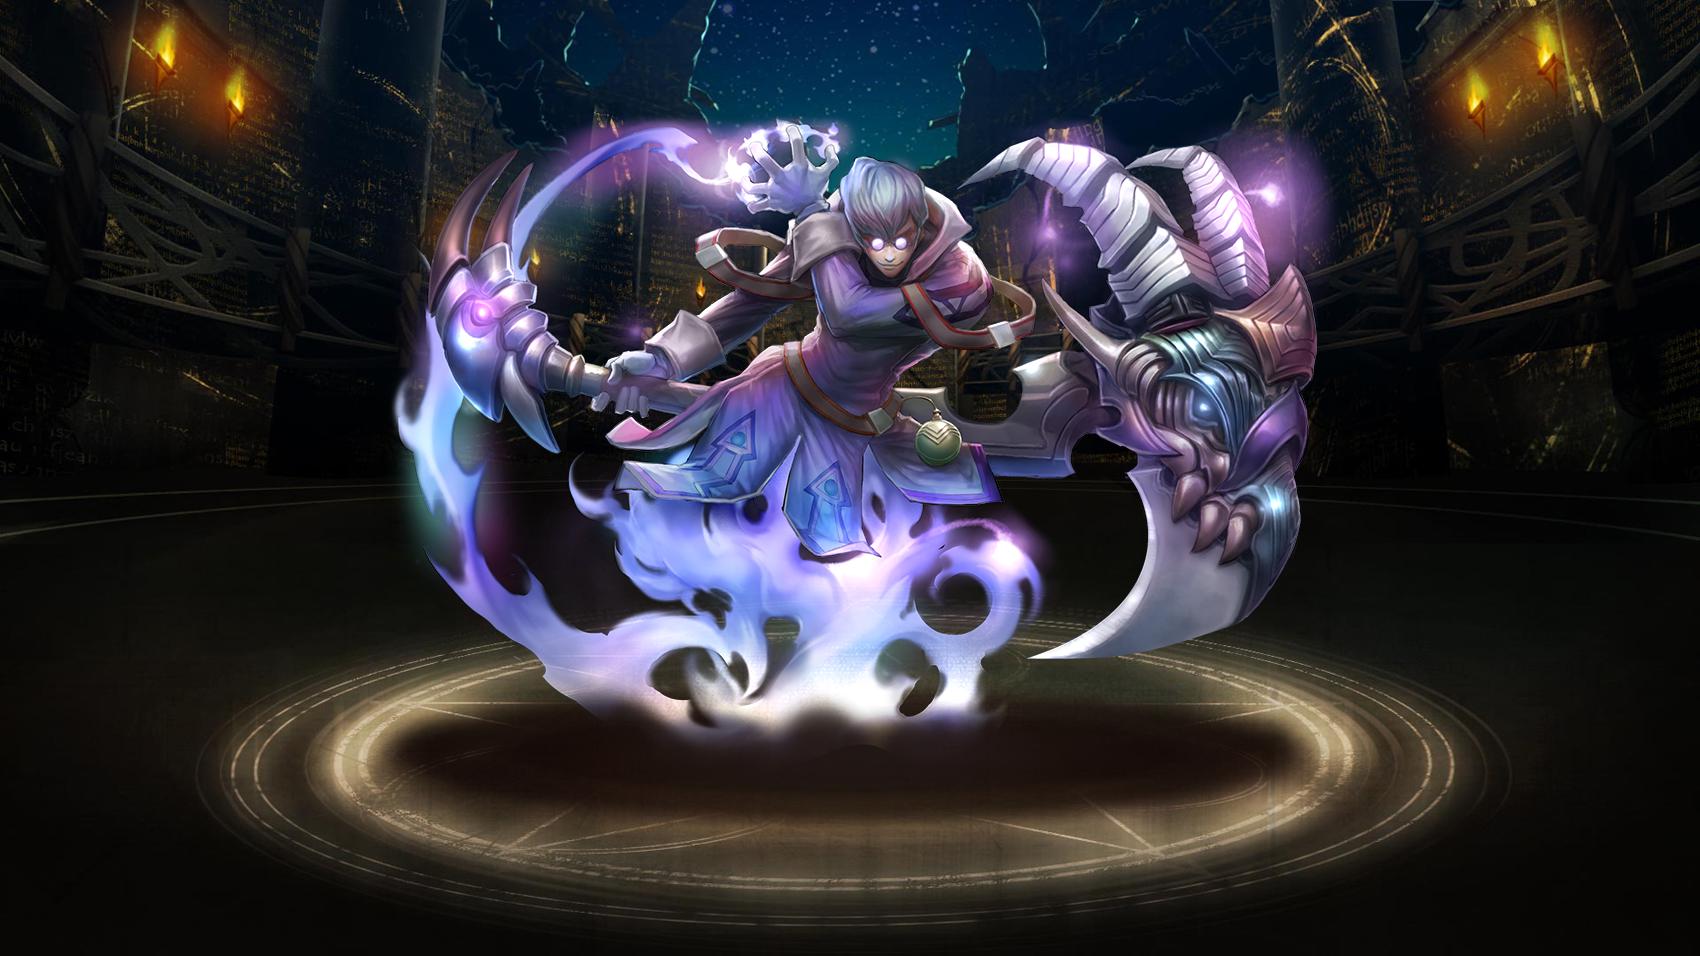 Astaroth the Duke of Hell